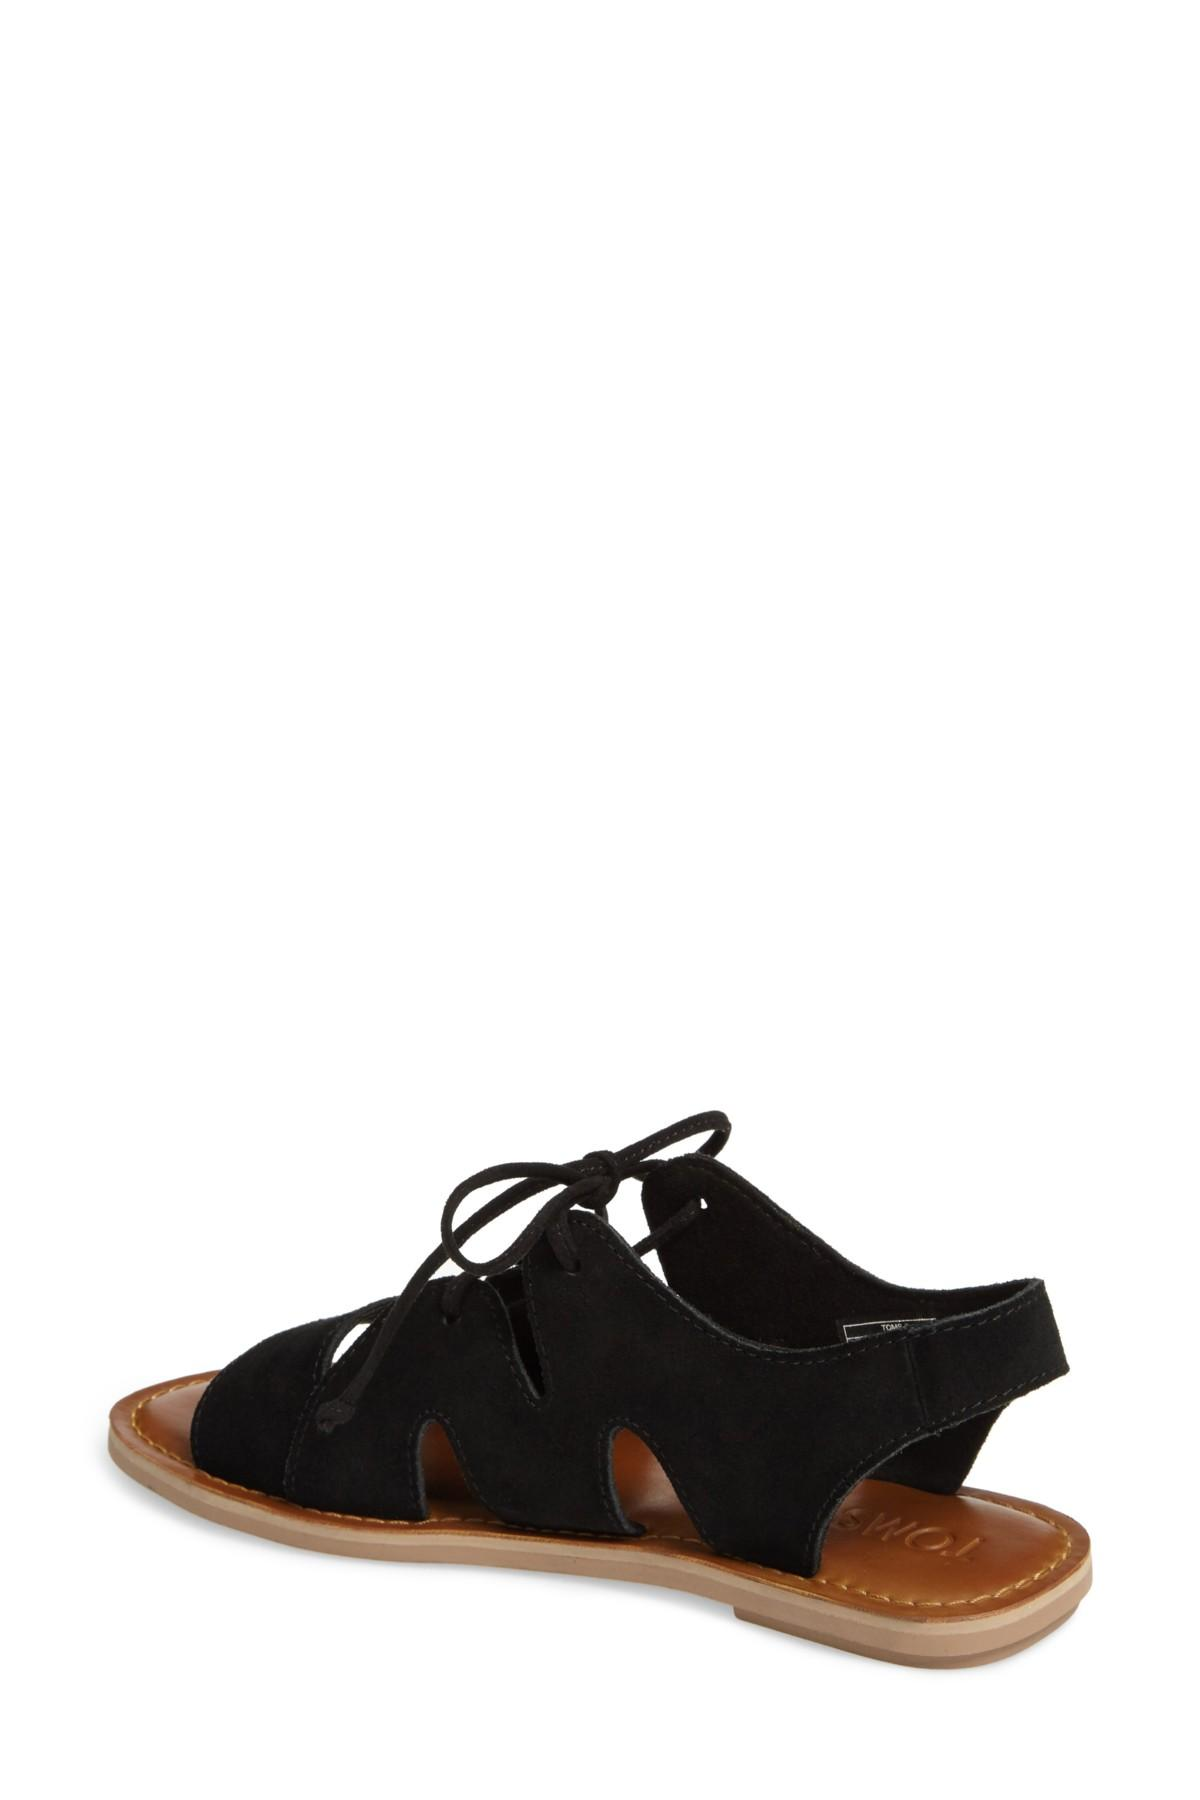 c33bbff232b8 Lyst - TOMS Calips Sandal in Black - Save 22.727272727272734%